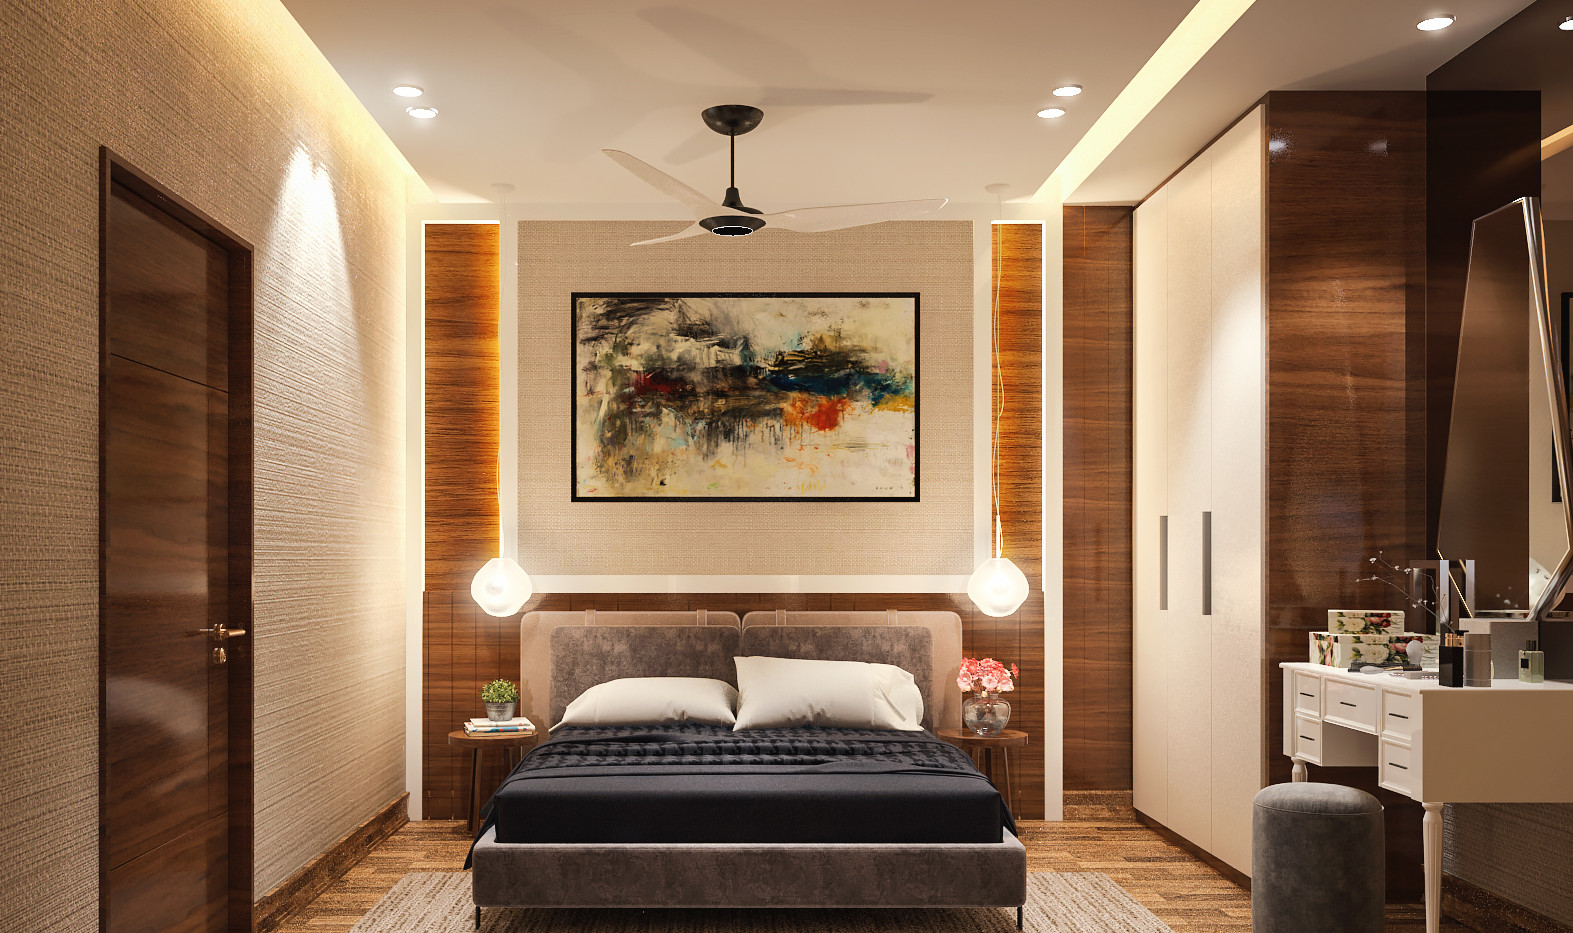 cam_1 bedroom_01_04.jpg